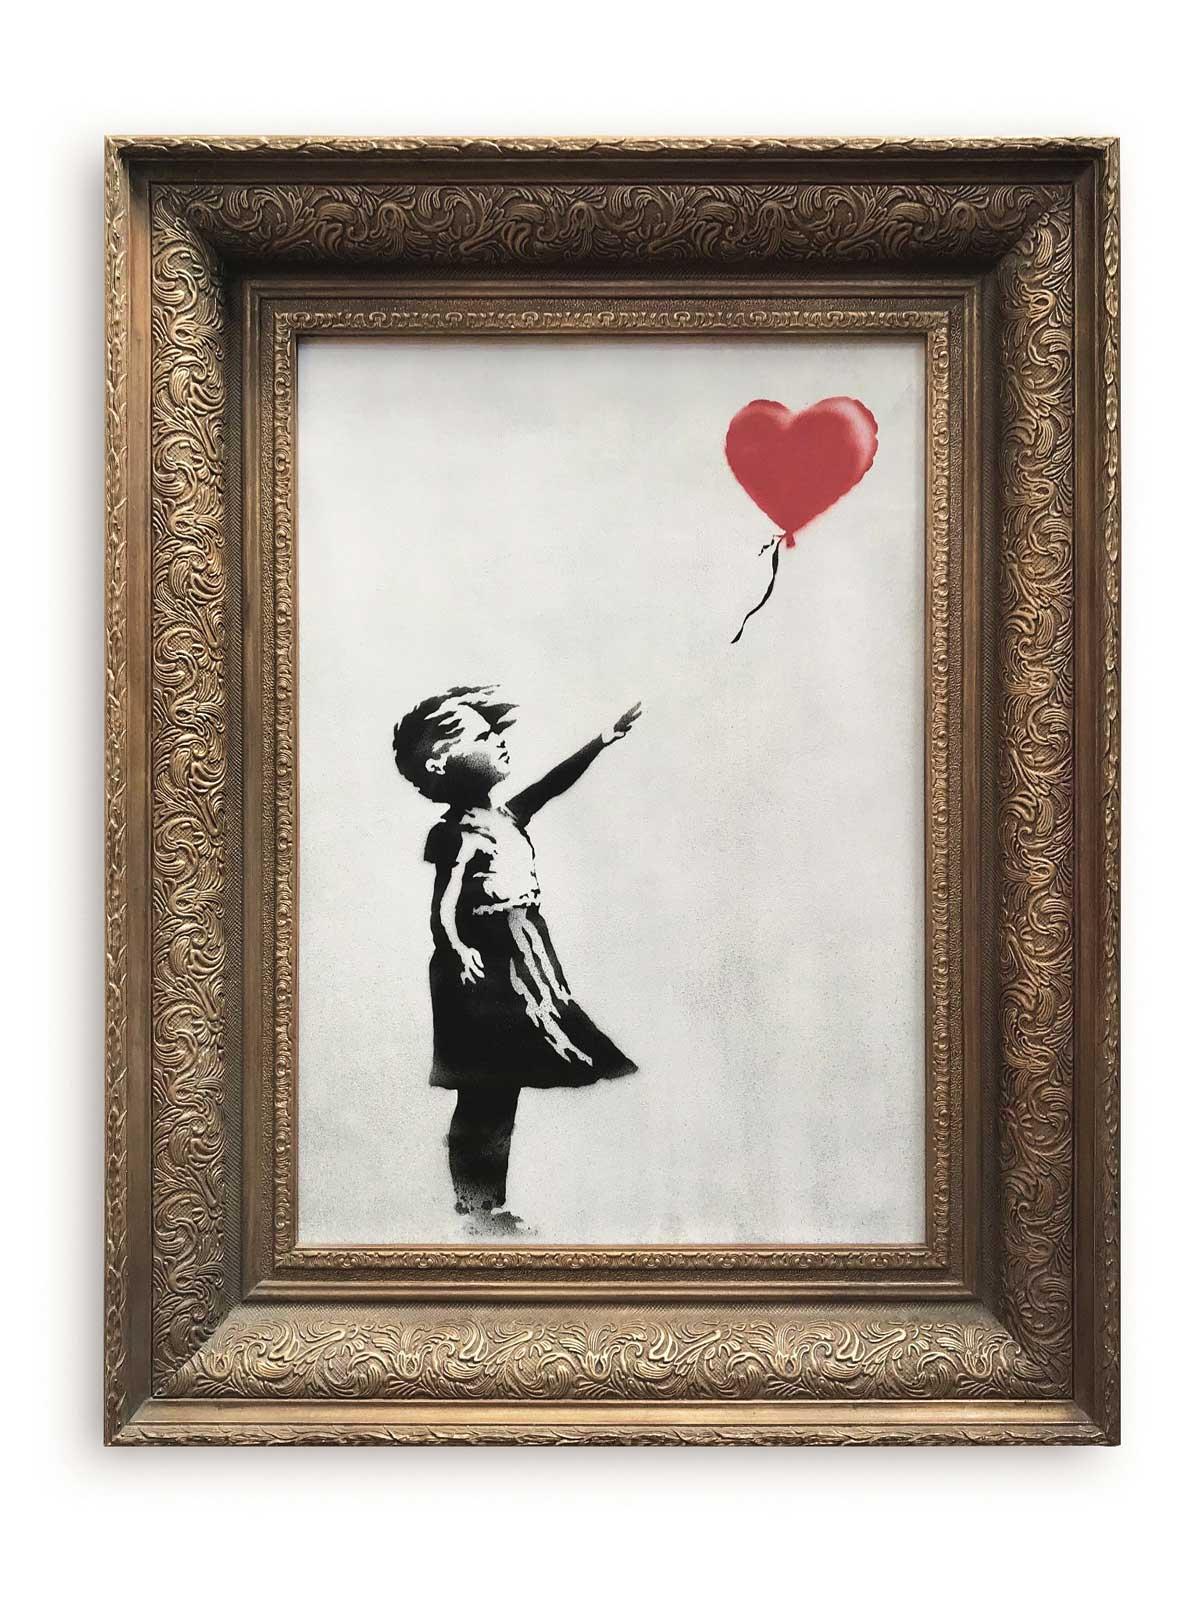 https://www.artsandcollections.com/wp-content/uploads/2018/10/banksy.jpg